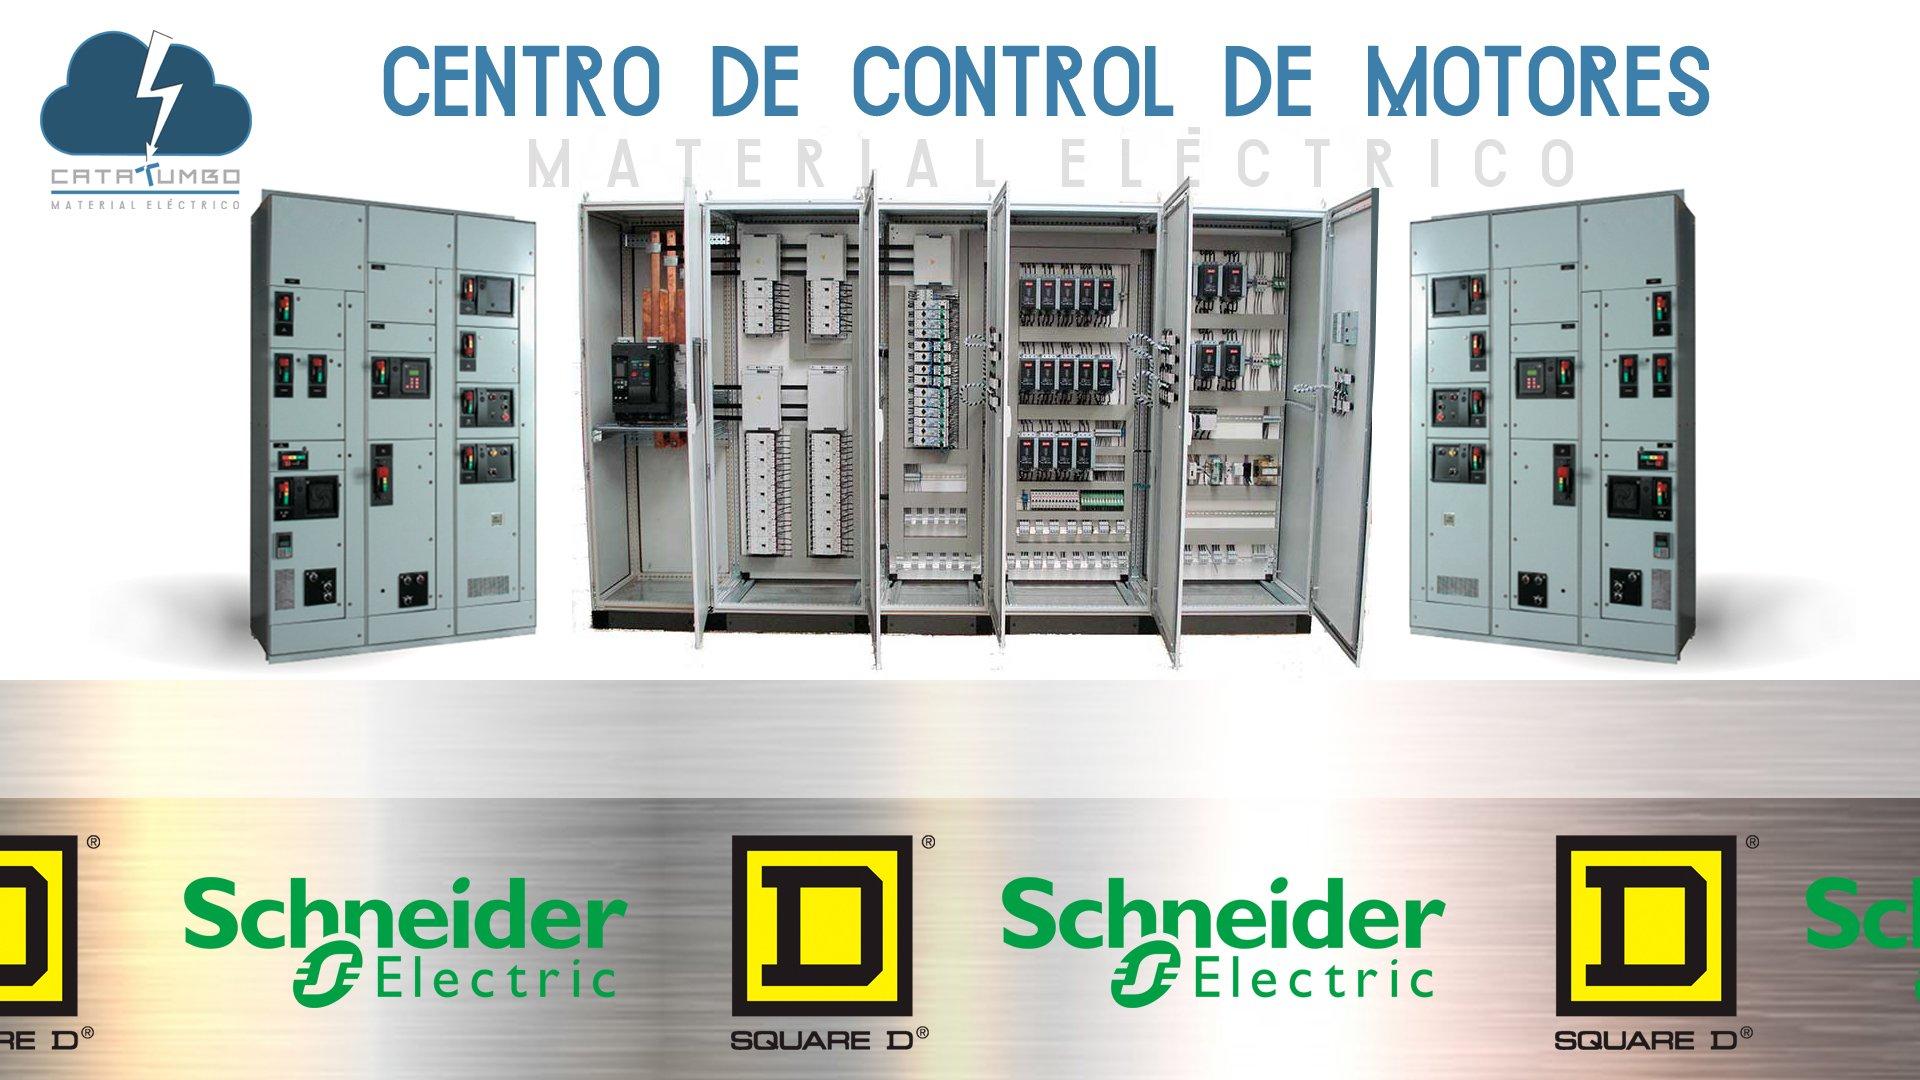 centro-de-control-de-motores-square-d-schneider-electric-material-eléctrico-catatumbo